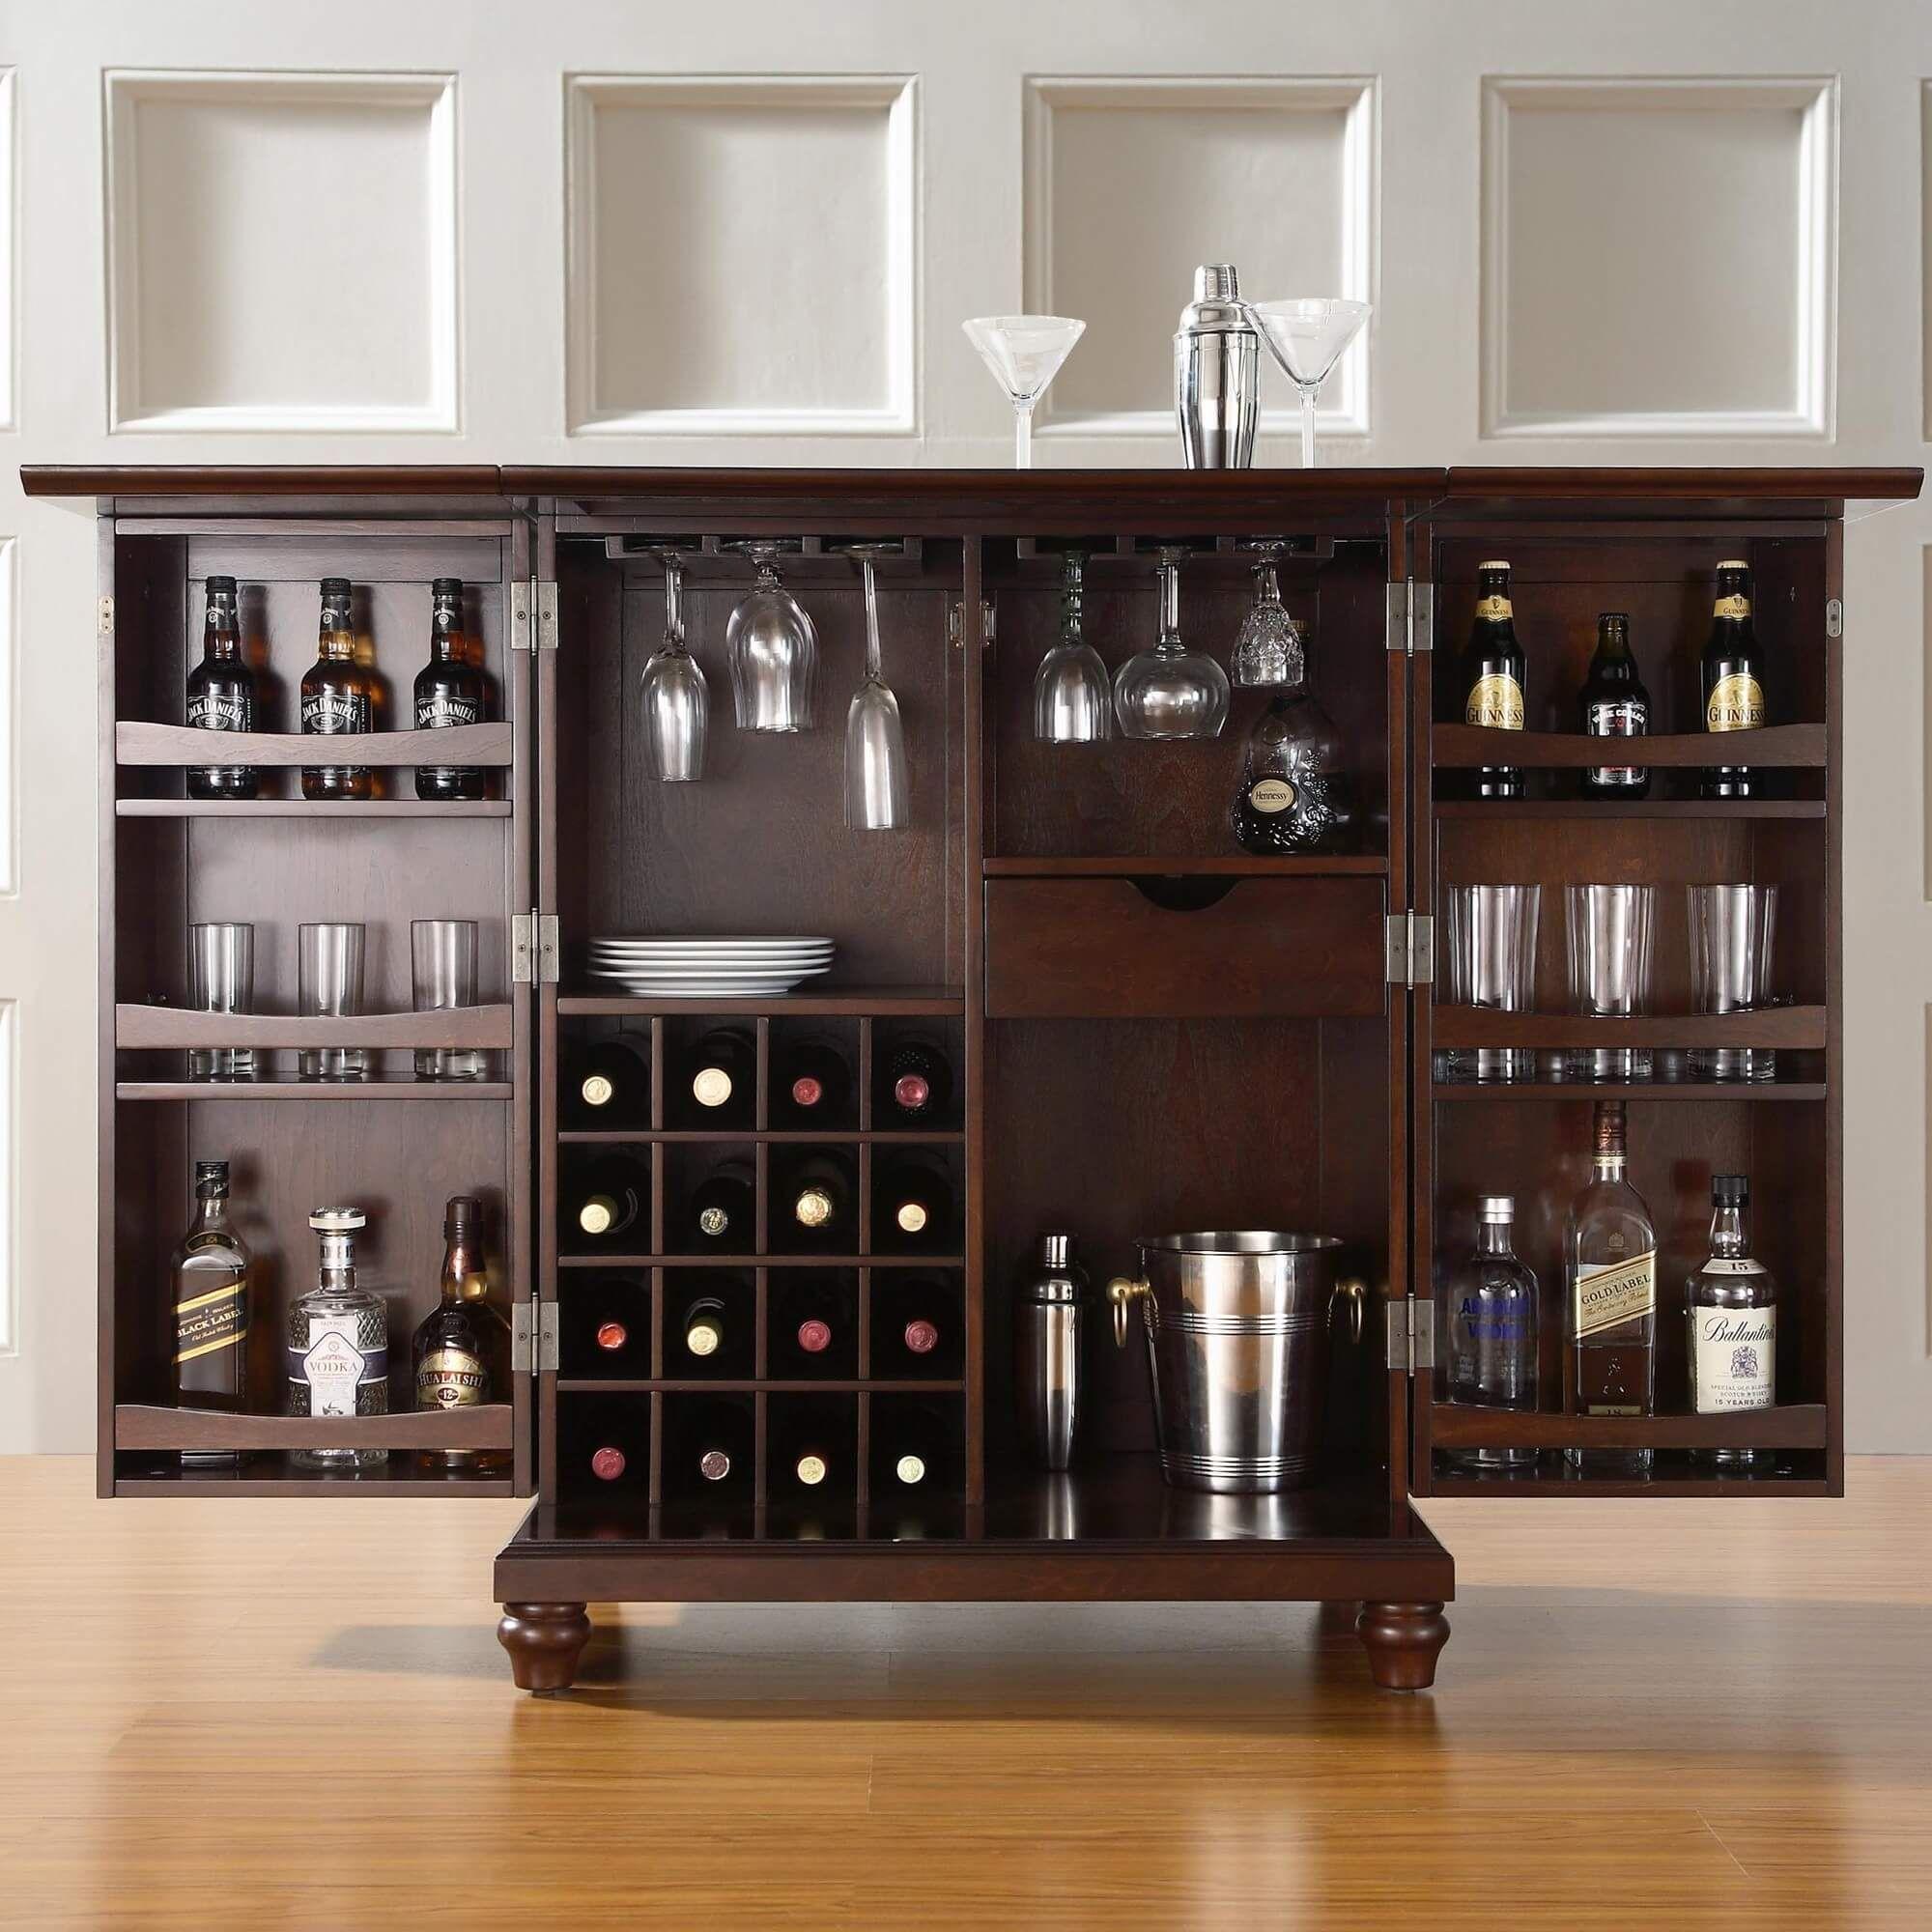 42 Top Home Bar Cabinets Sets Wine Bars 2020 Home Bar